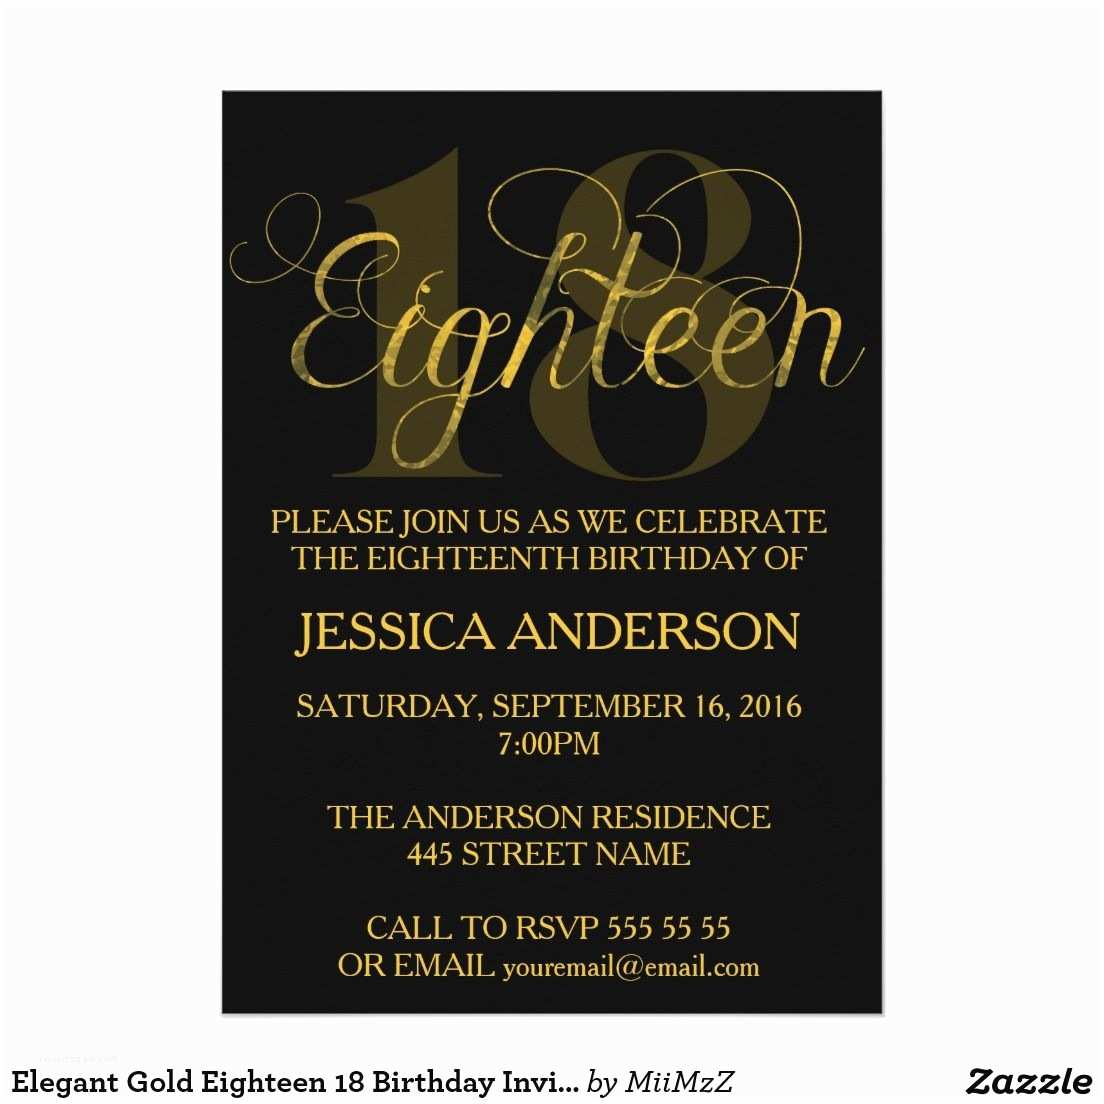 18th Birthday Invitations Get Free 18th Birthday Invitations Wording